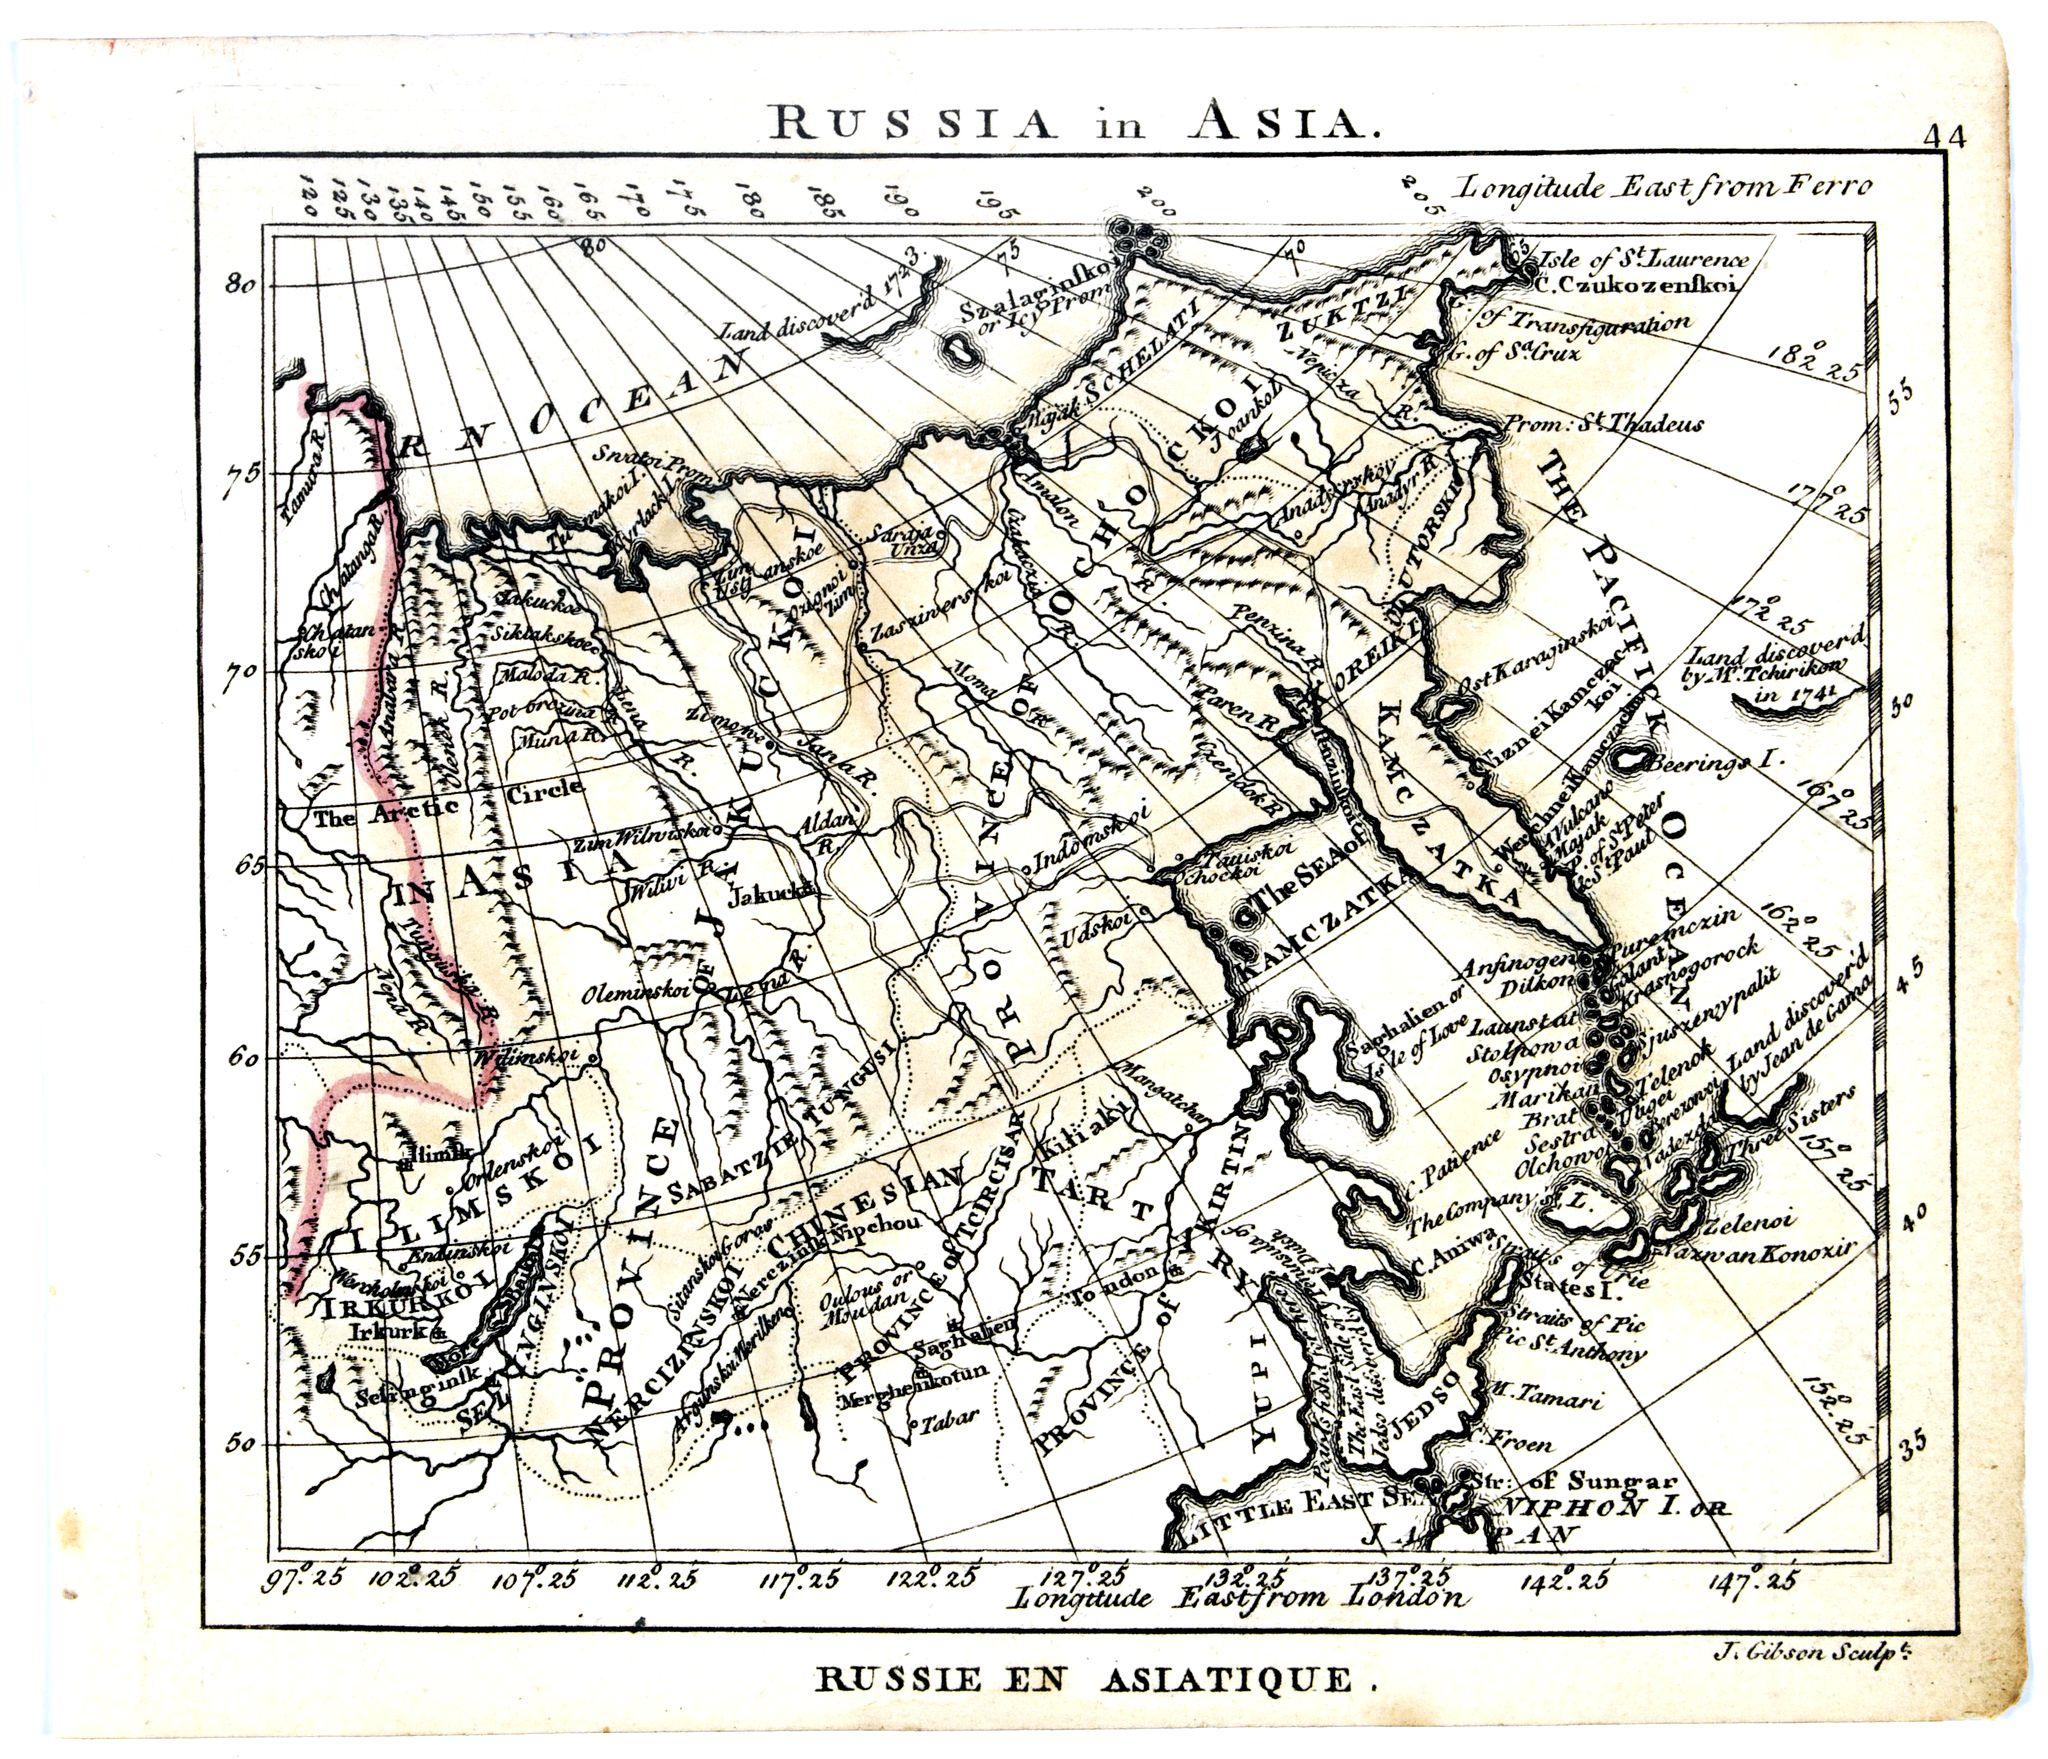 DURY, A. / SAYER, R. / KITCHIN, T. -  Russia in Asia.